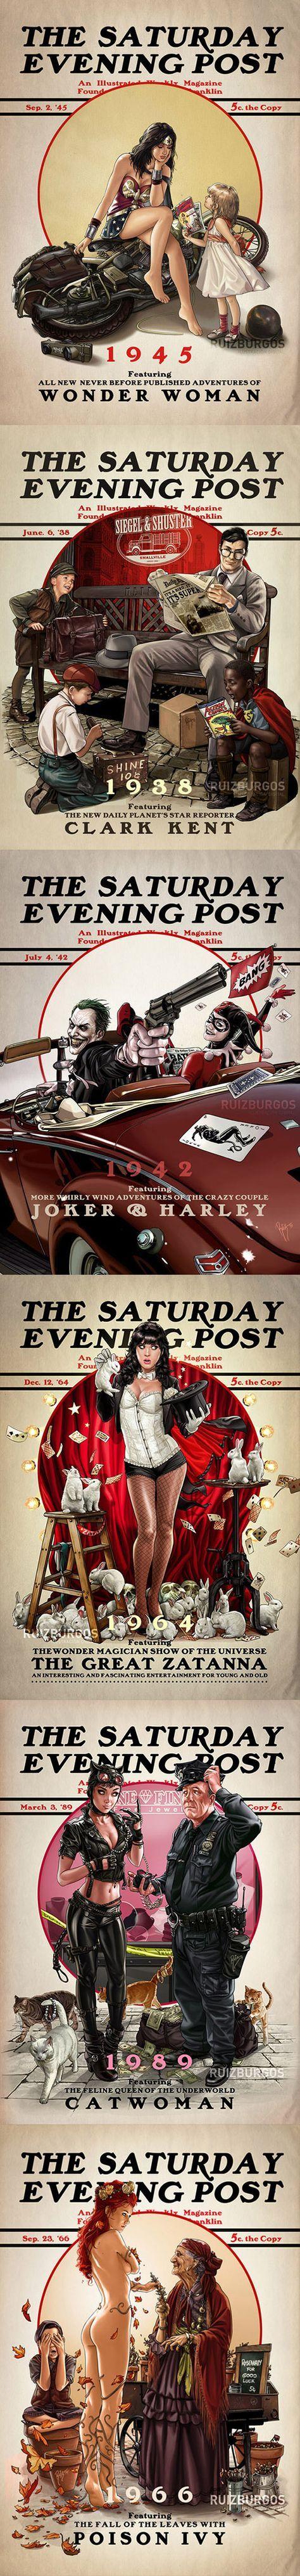 "Norman Rockwell inspired ""Saturday Evening Post"" series by OnlyMilo @deviantart a.k.a. Ruiz Burgos"